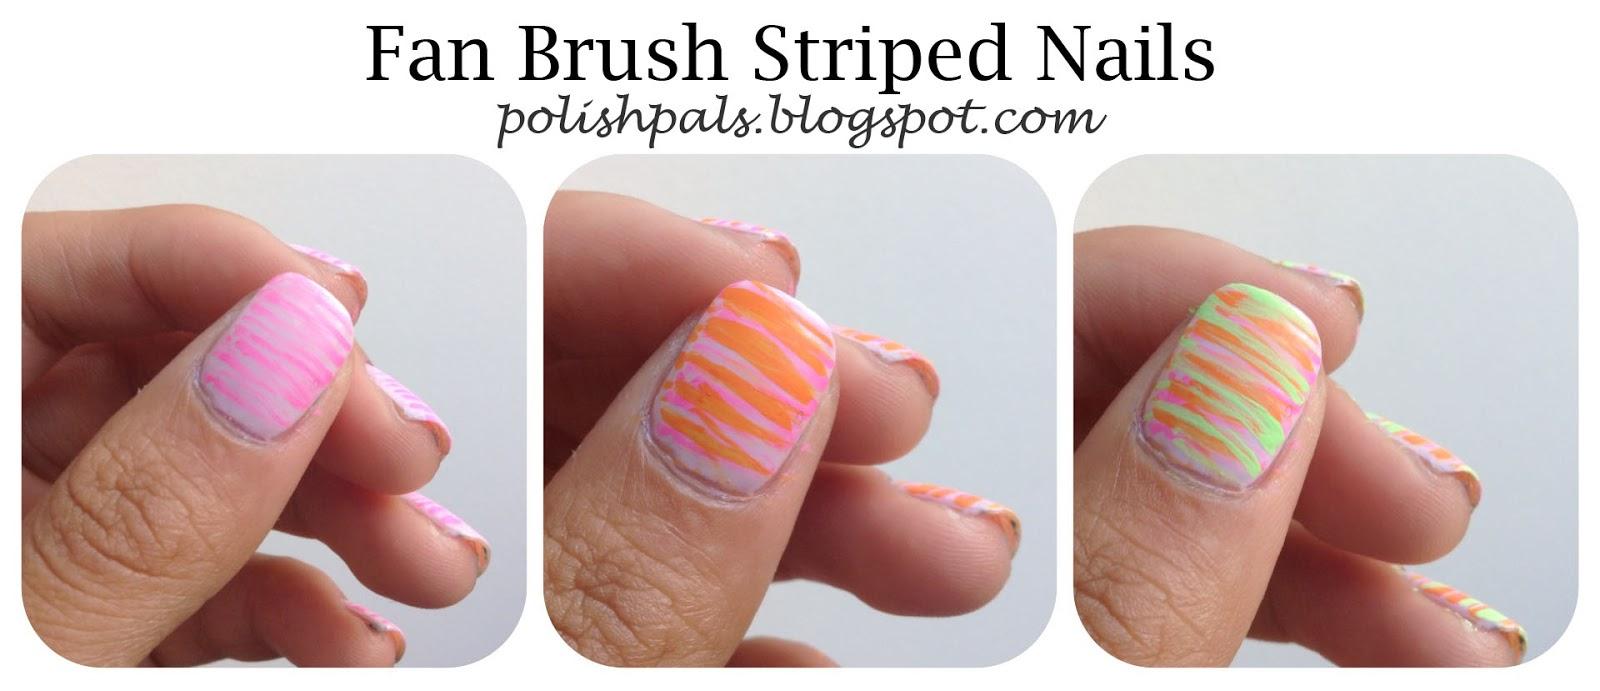 Polish Pals: Fan Brush Striped Nails